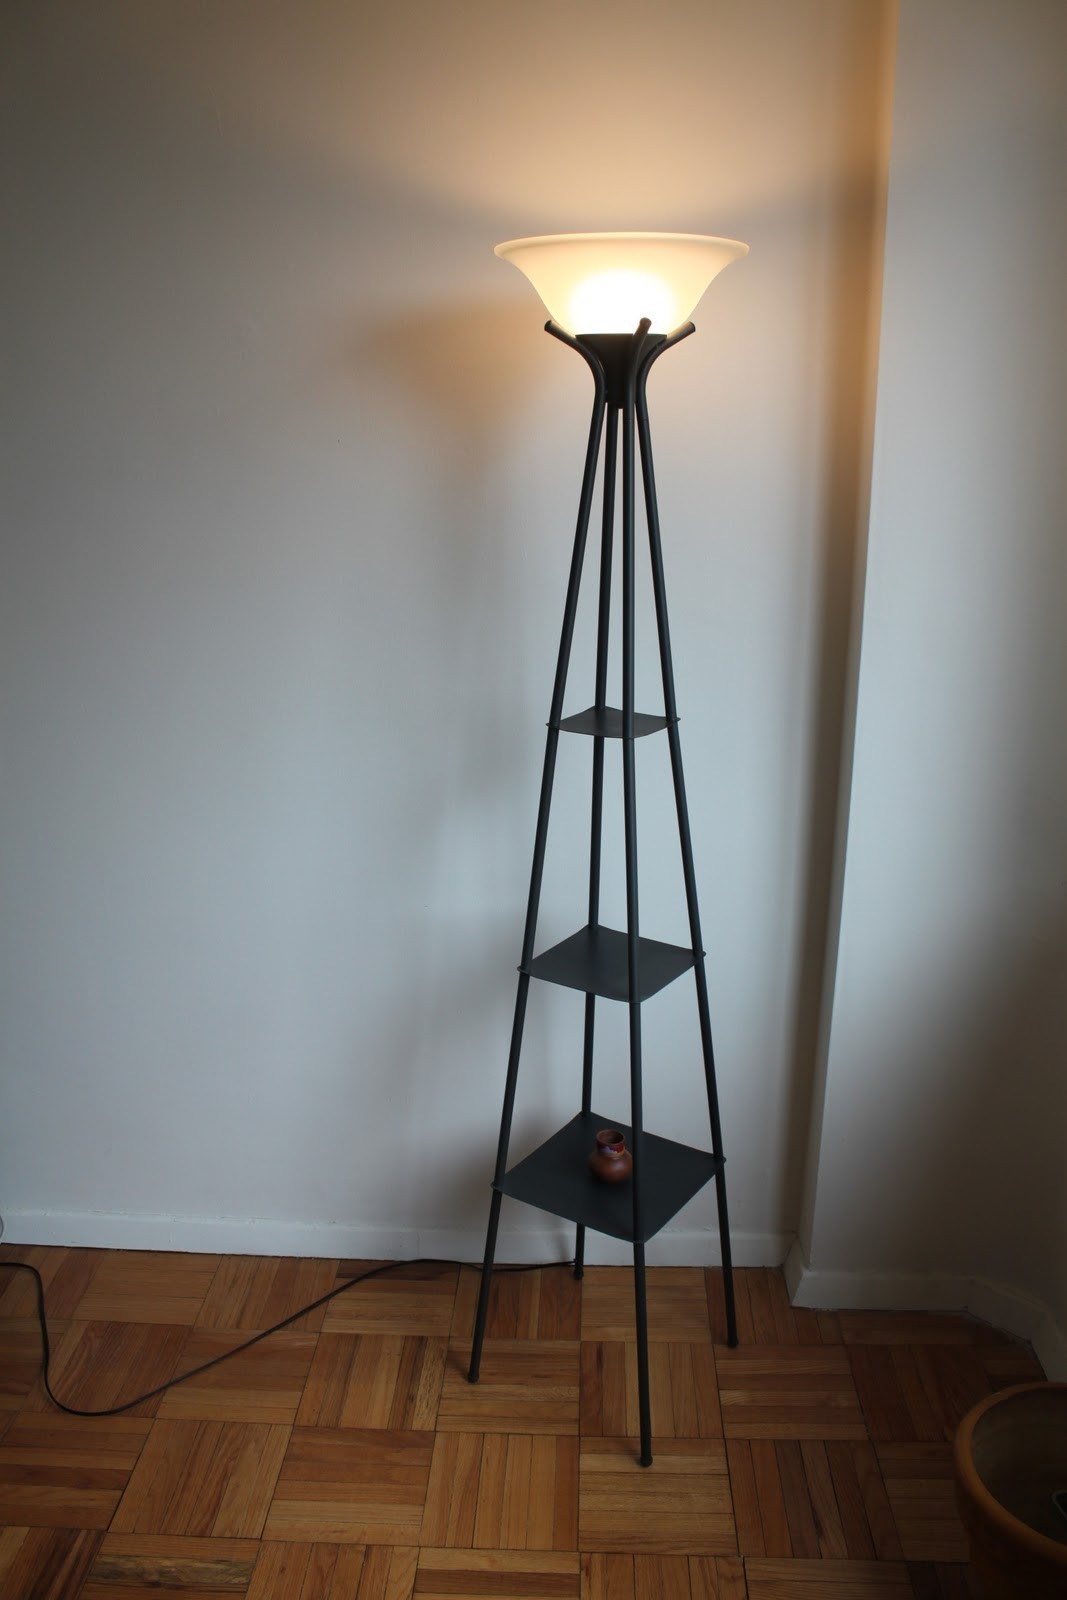 Floor Lamp With Shelves 3